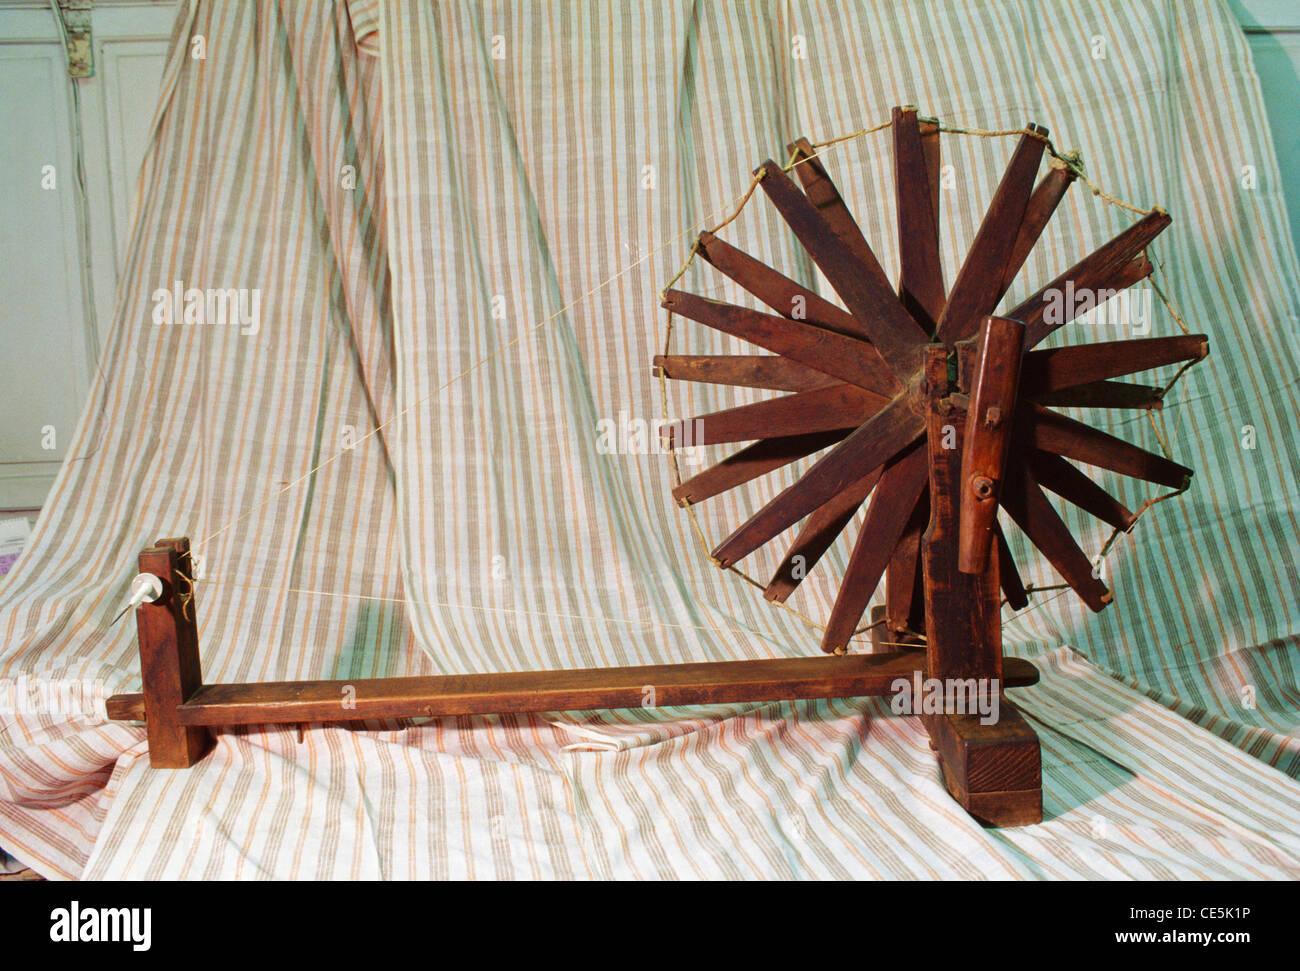 Mahatma Gandhi charkha spinning wheel India Stock Photo: 43150626